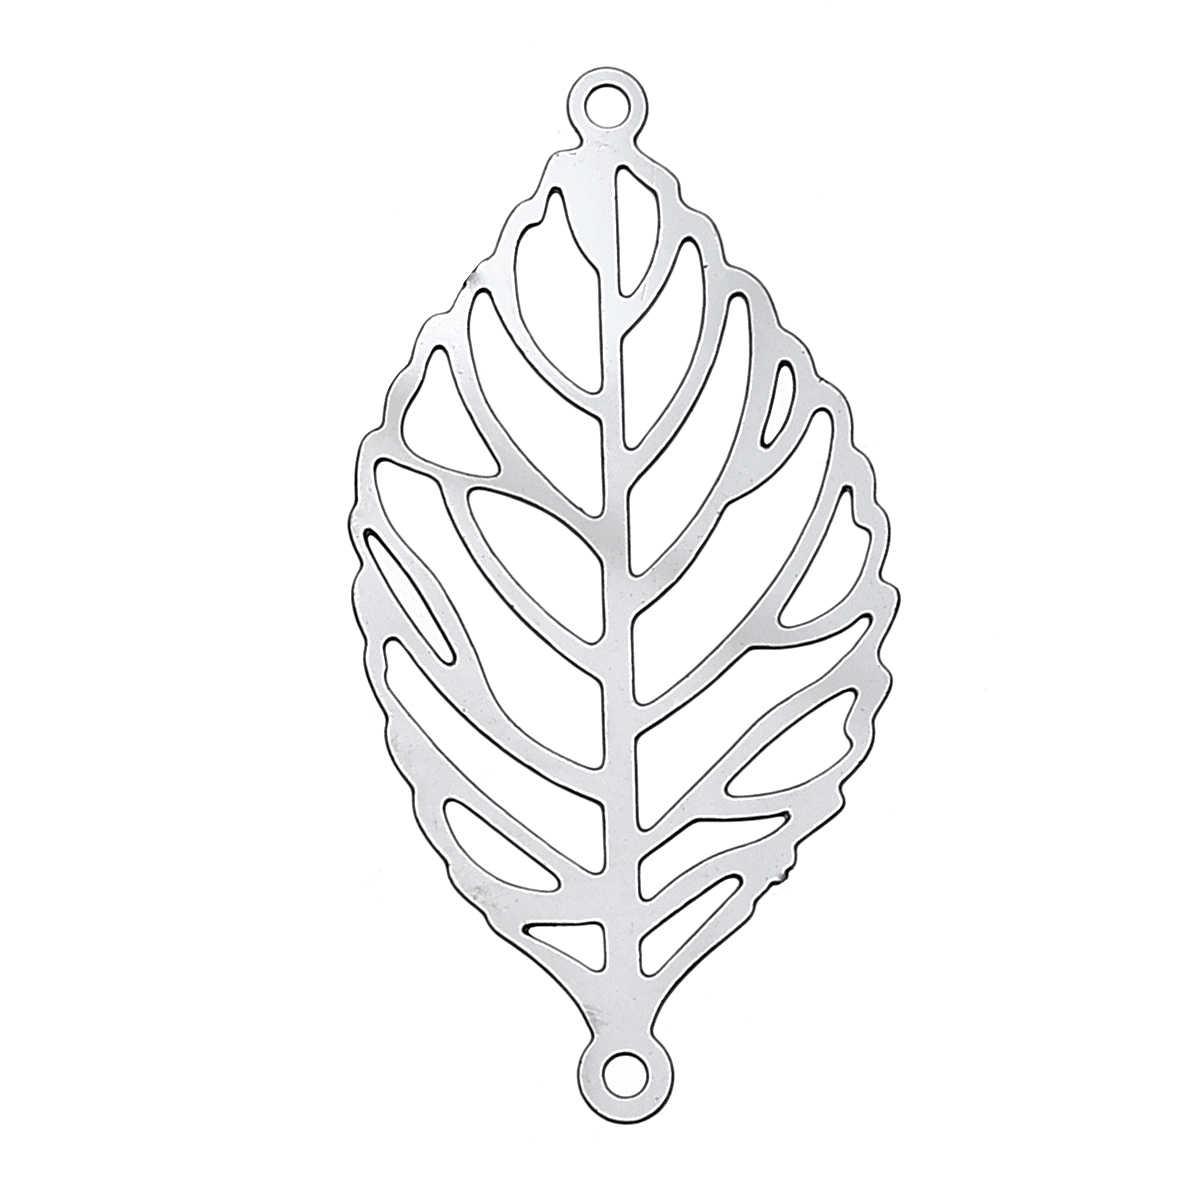 DoreenBeads Filigree สแตนเลส Connectors ผลการค้นหาเครื่องประดับ Leaf สี 30x15 มม.,รู: 1 มม.1 ชิ้น 2017 ใหม่